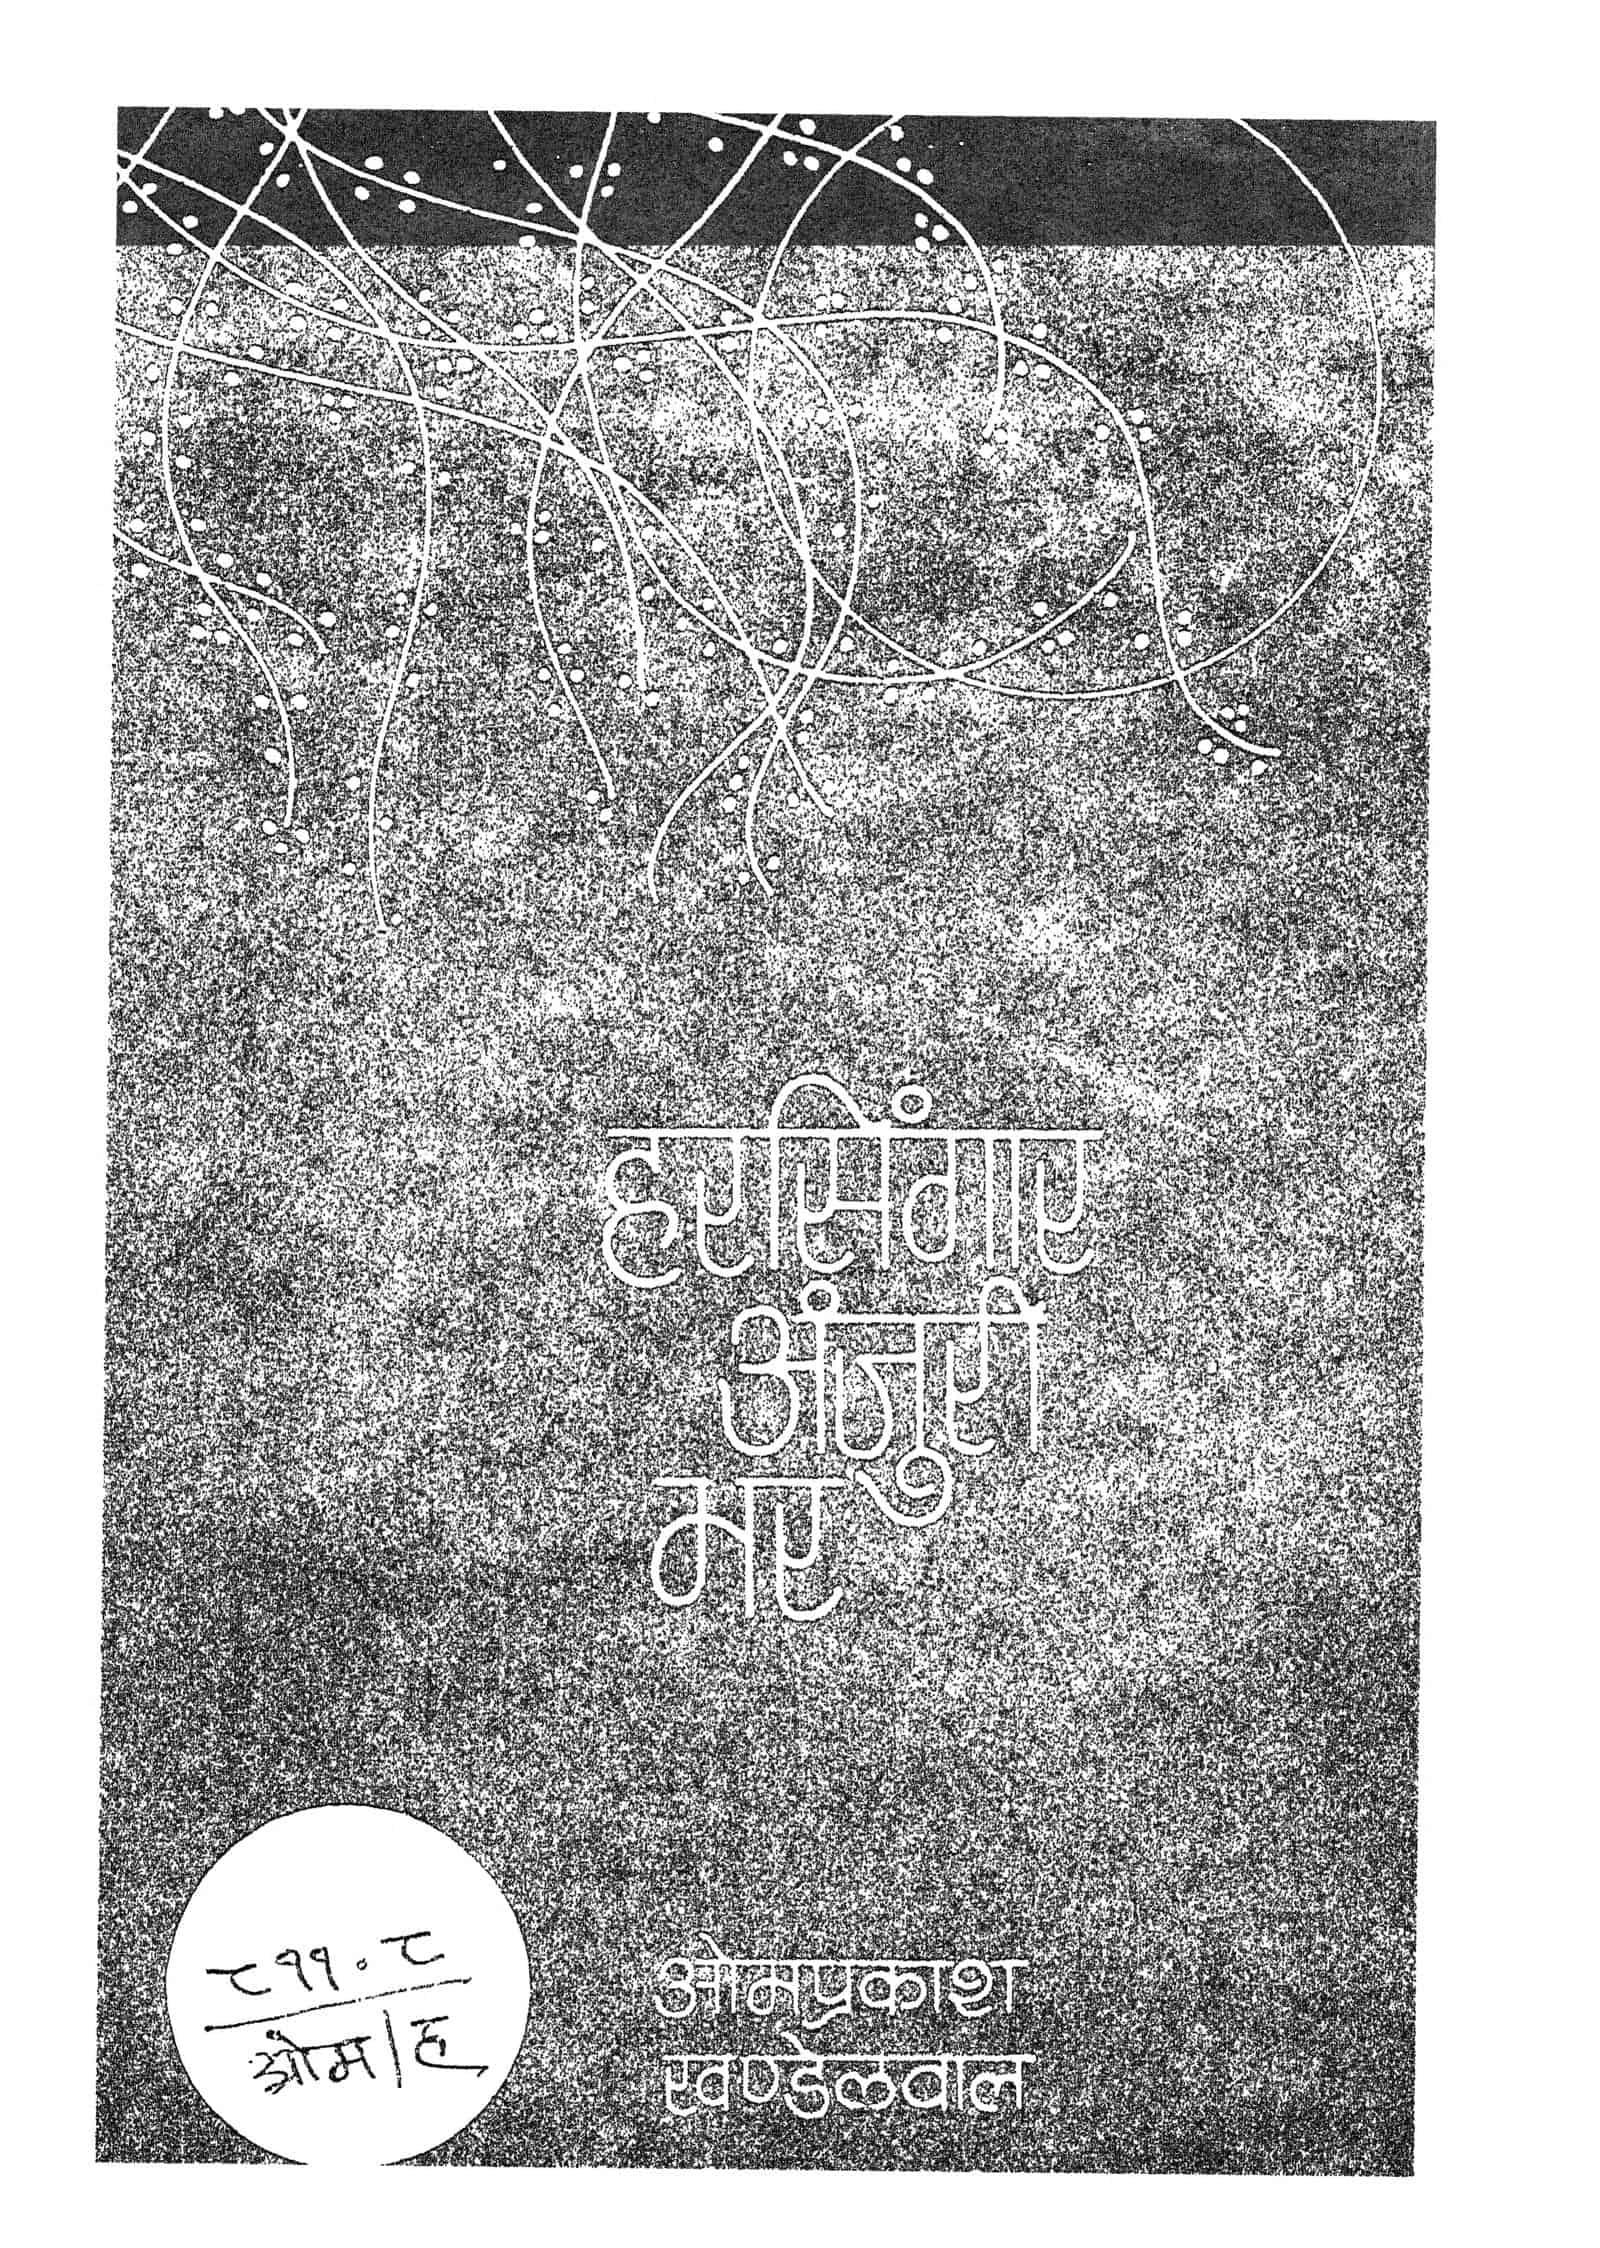 Book Image : हर सिंगार अंजुरी भर - Har Singar Anjuri Bhar